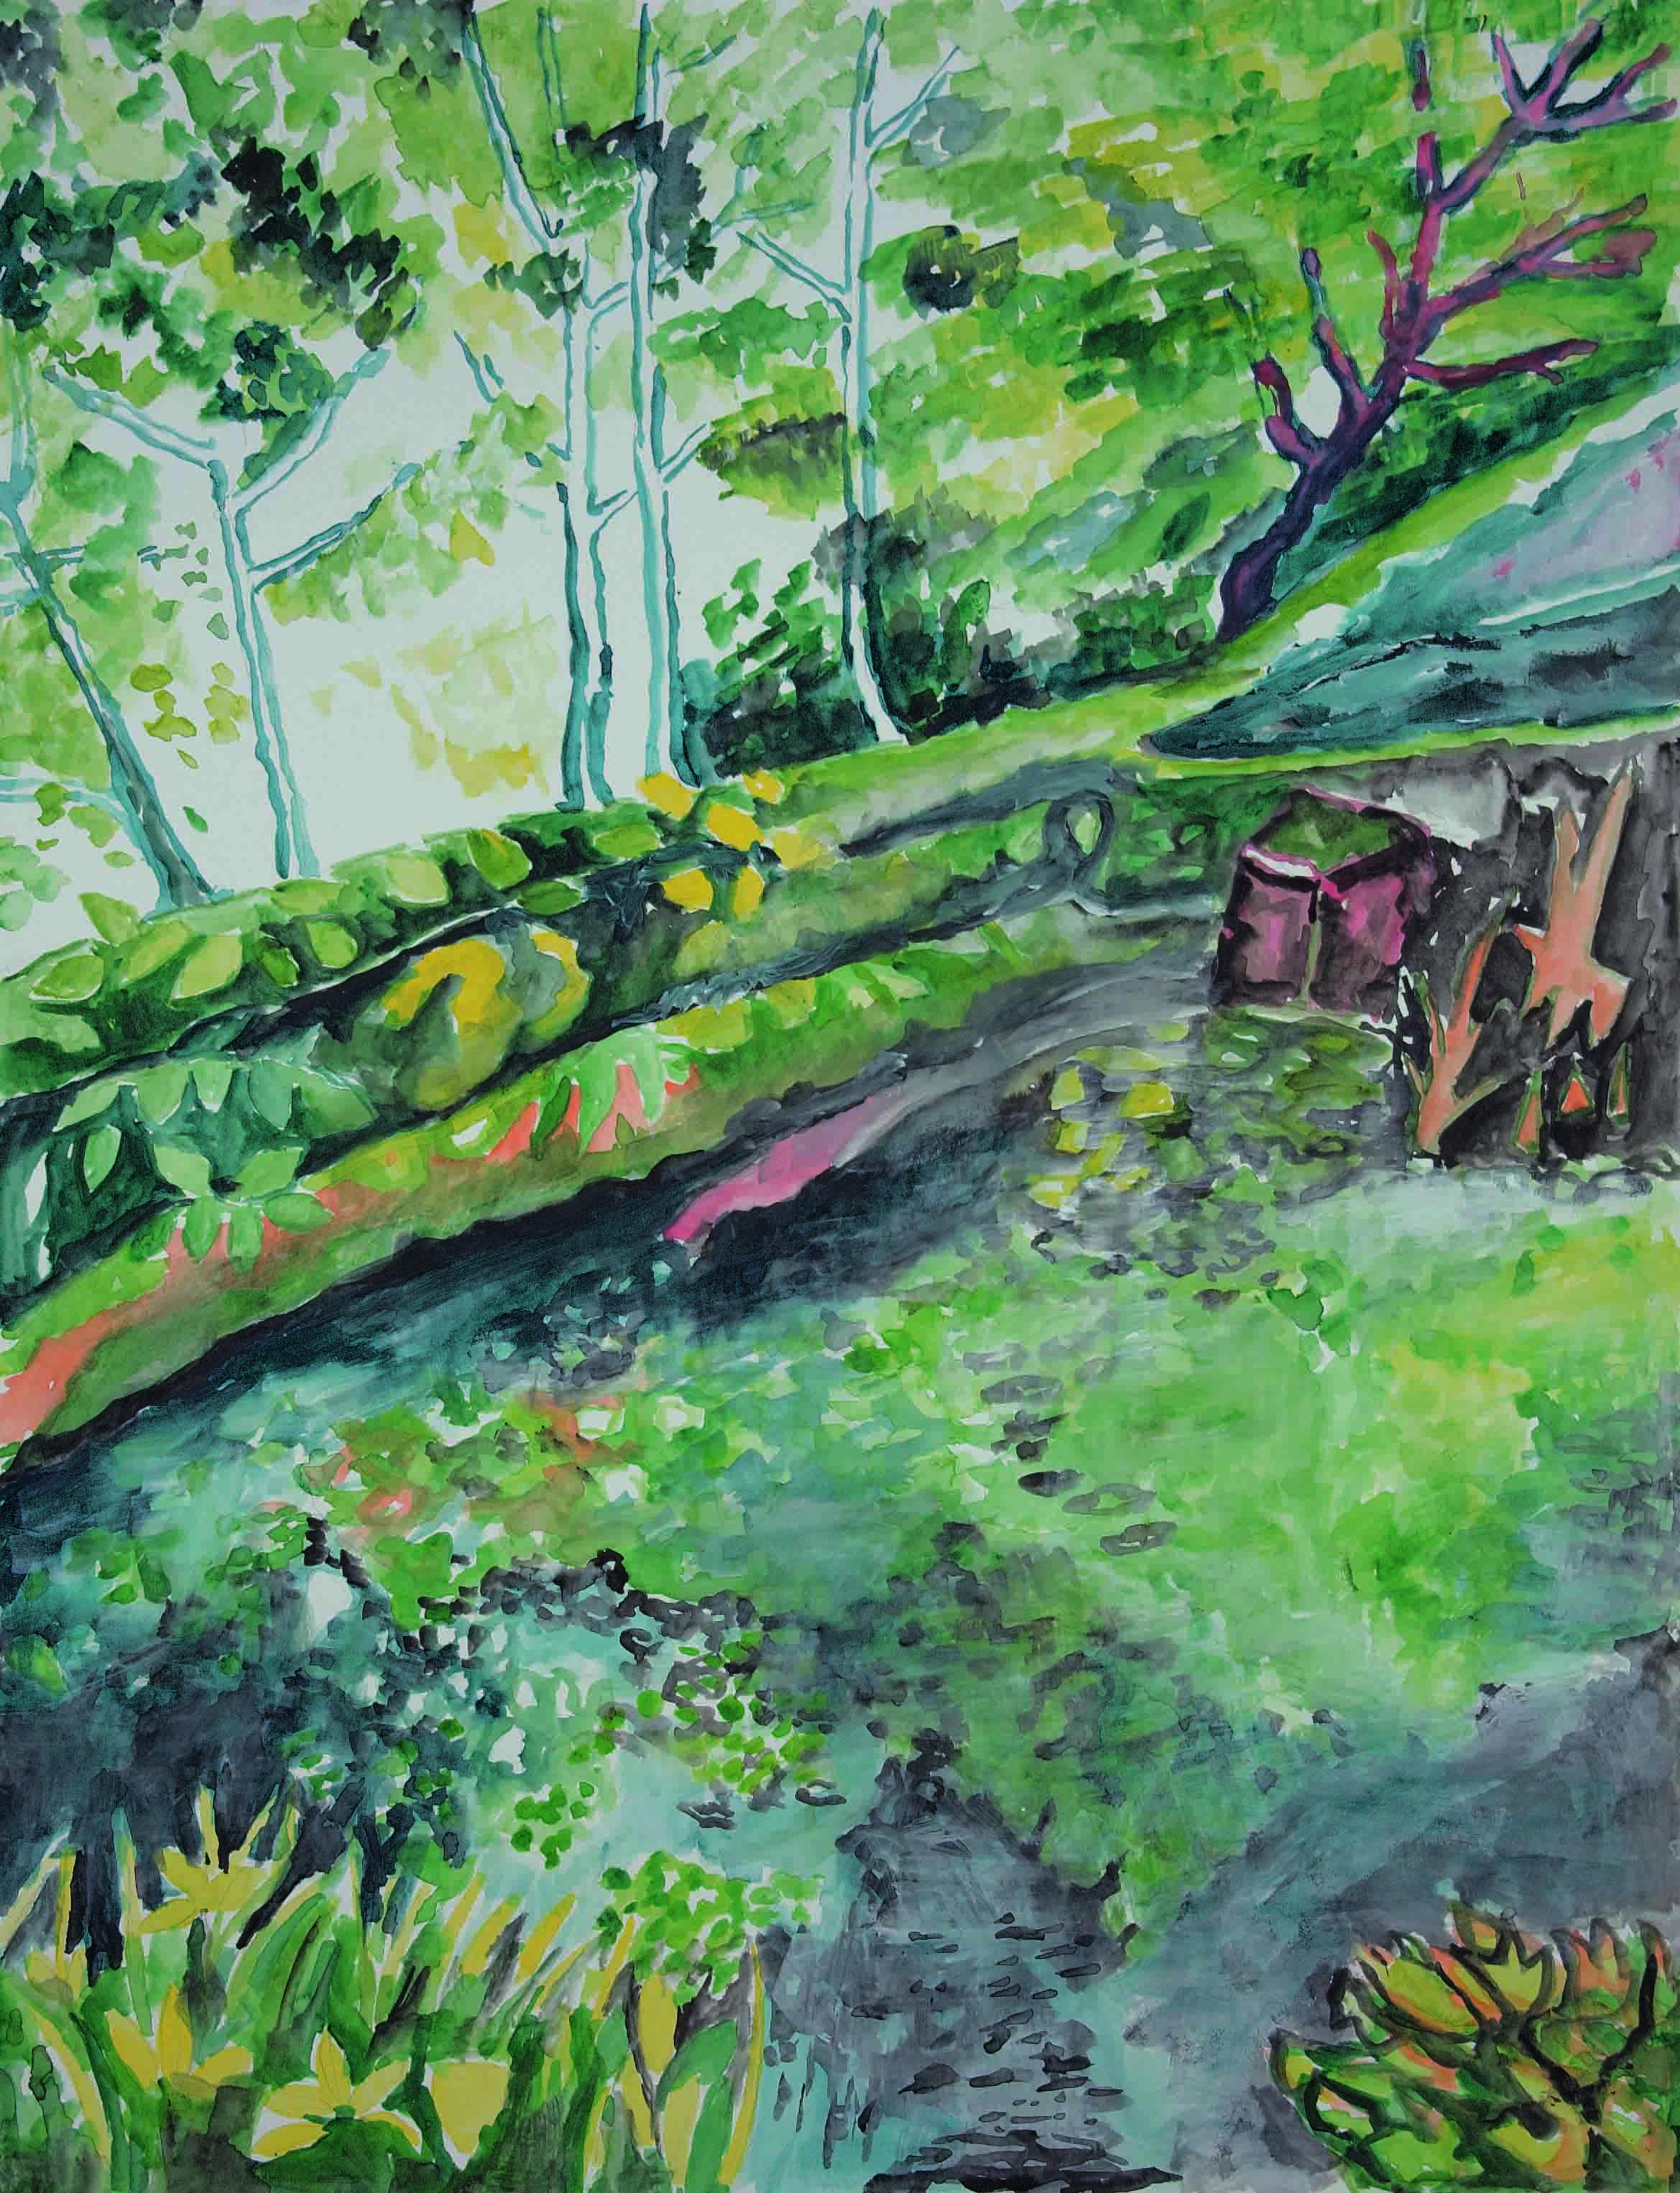 8 Giugnio 2017, Aquarell auf Papier, 55 x 46 cm, Courtesy: hilleckes probst galerie